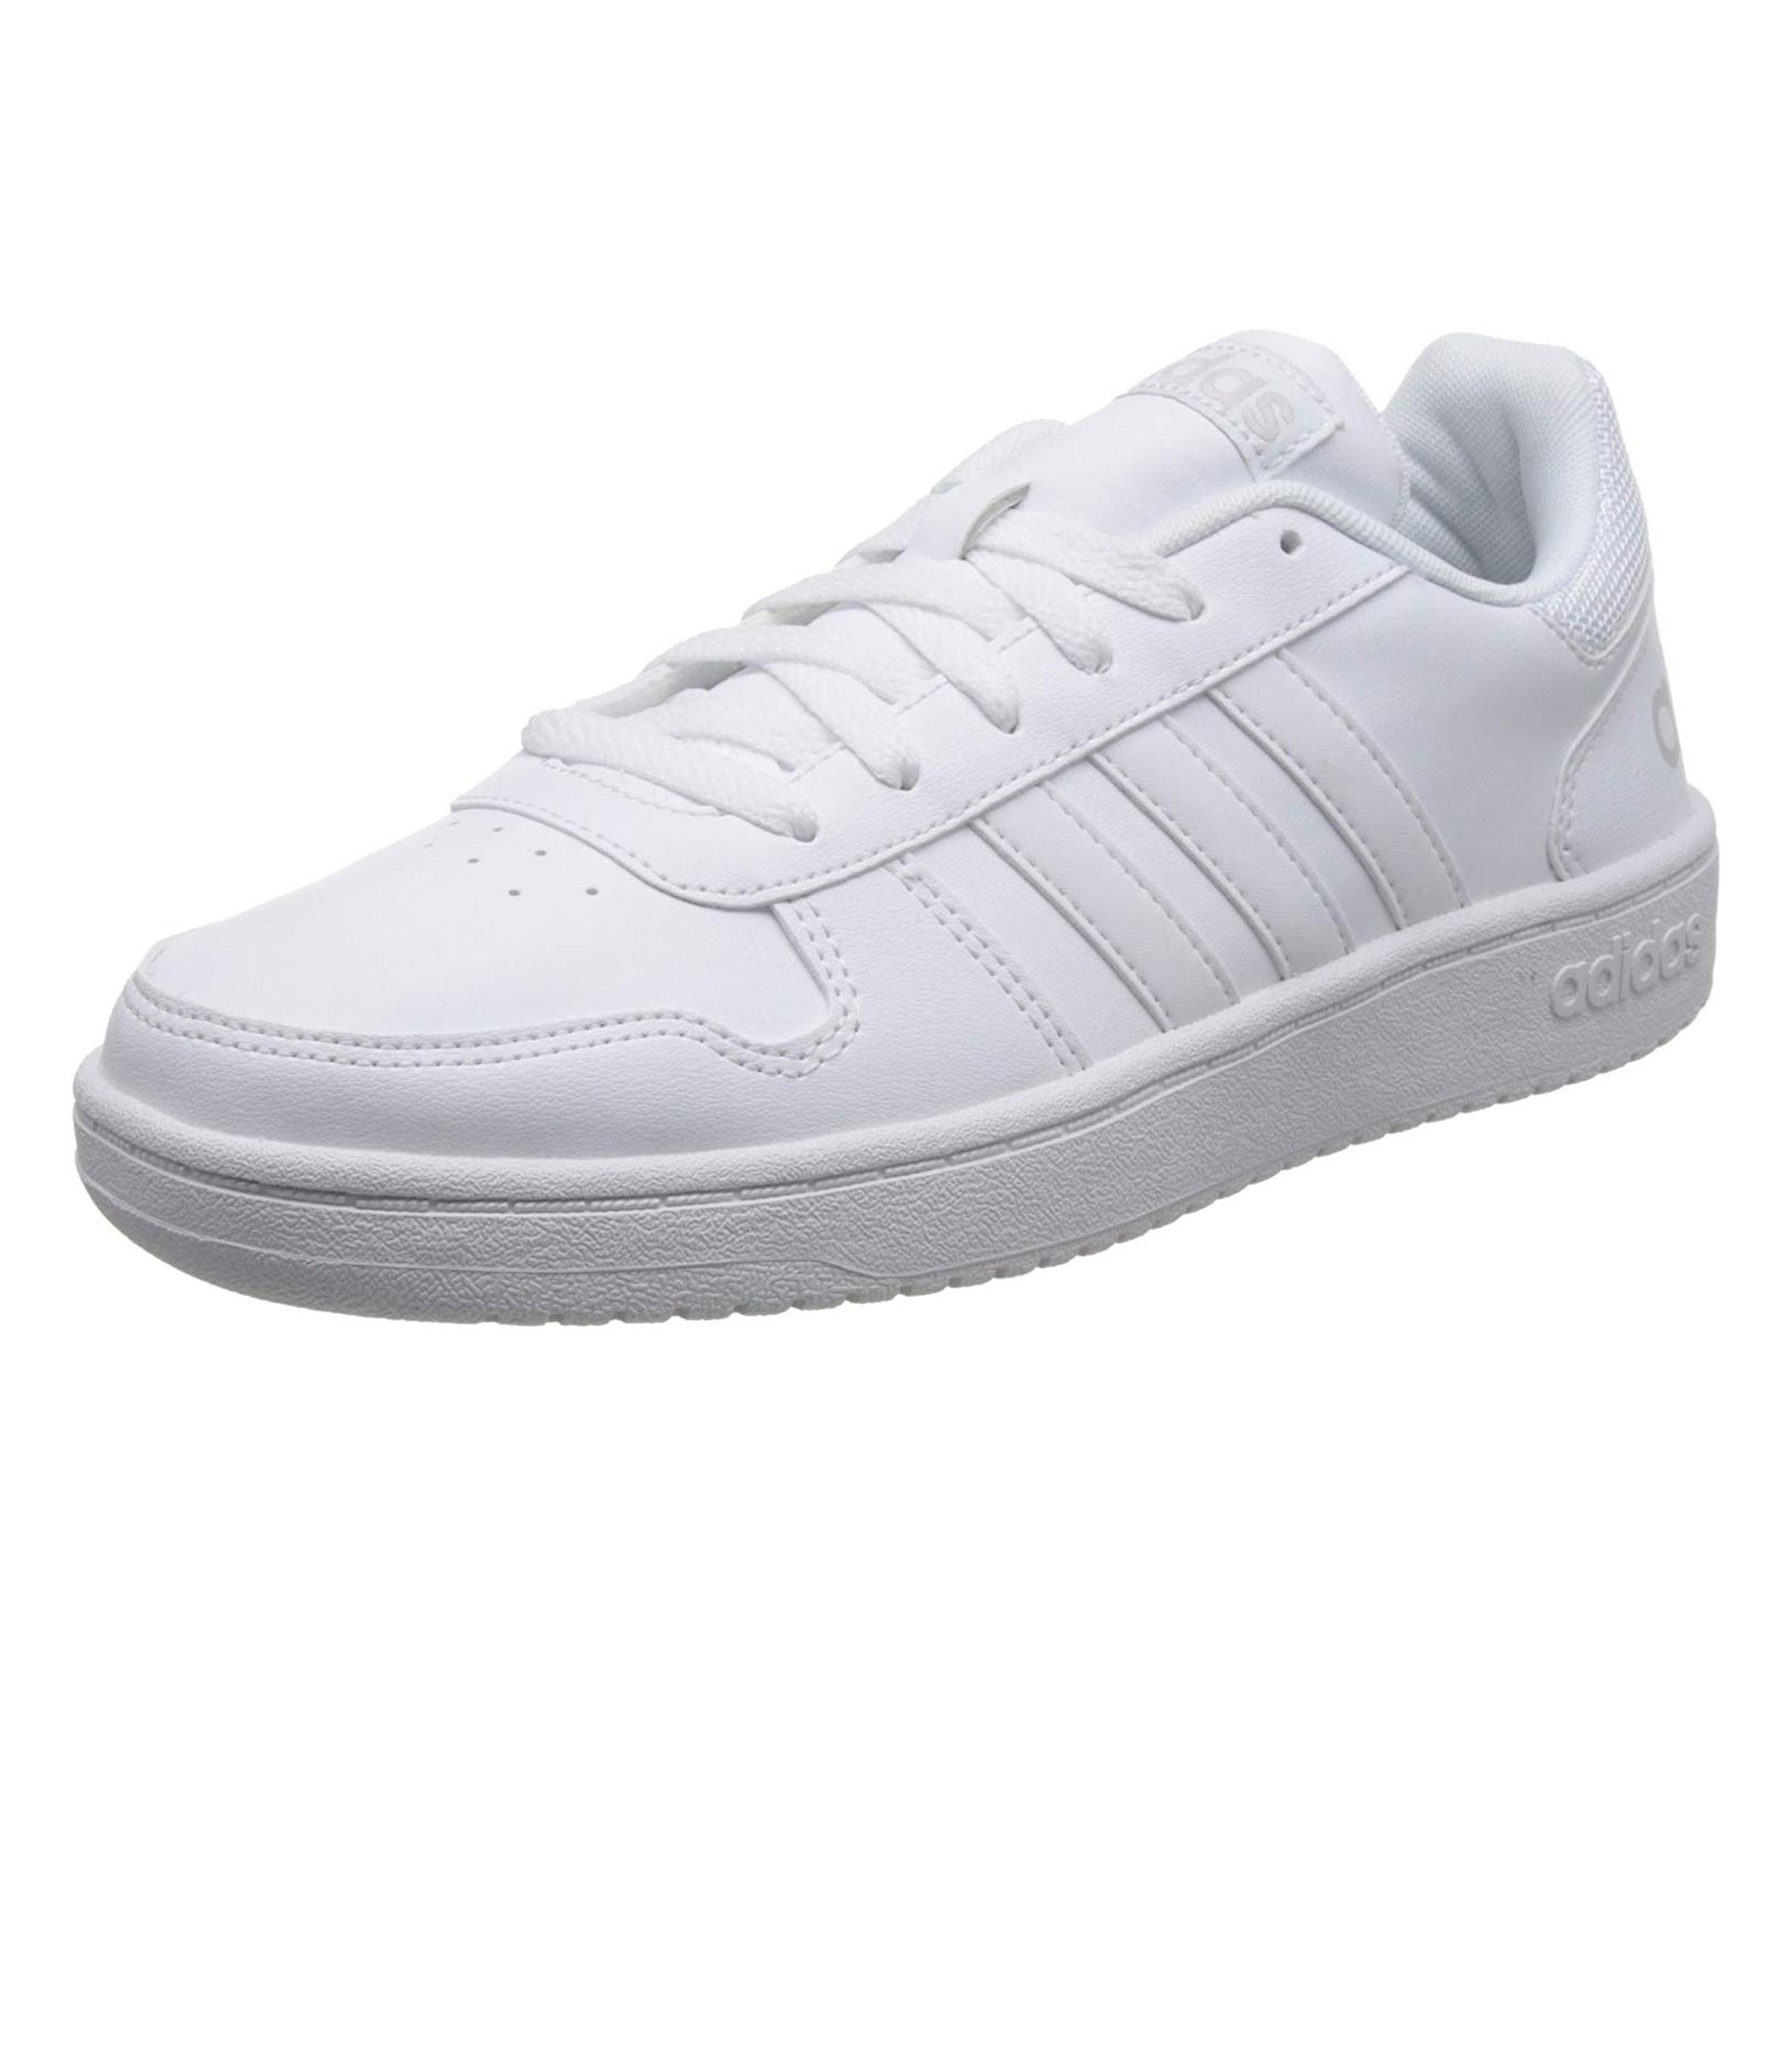 Scarpe Sneakers basse bianche Adidas Hoops 2.0 da uomo rif